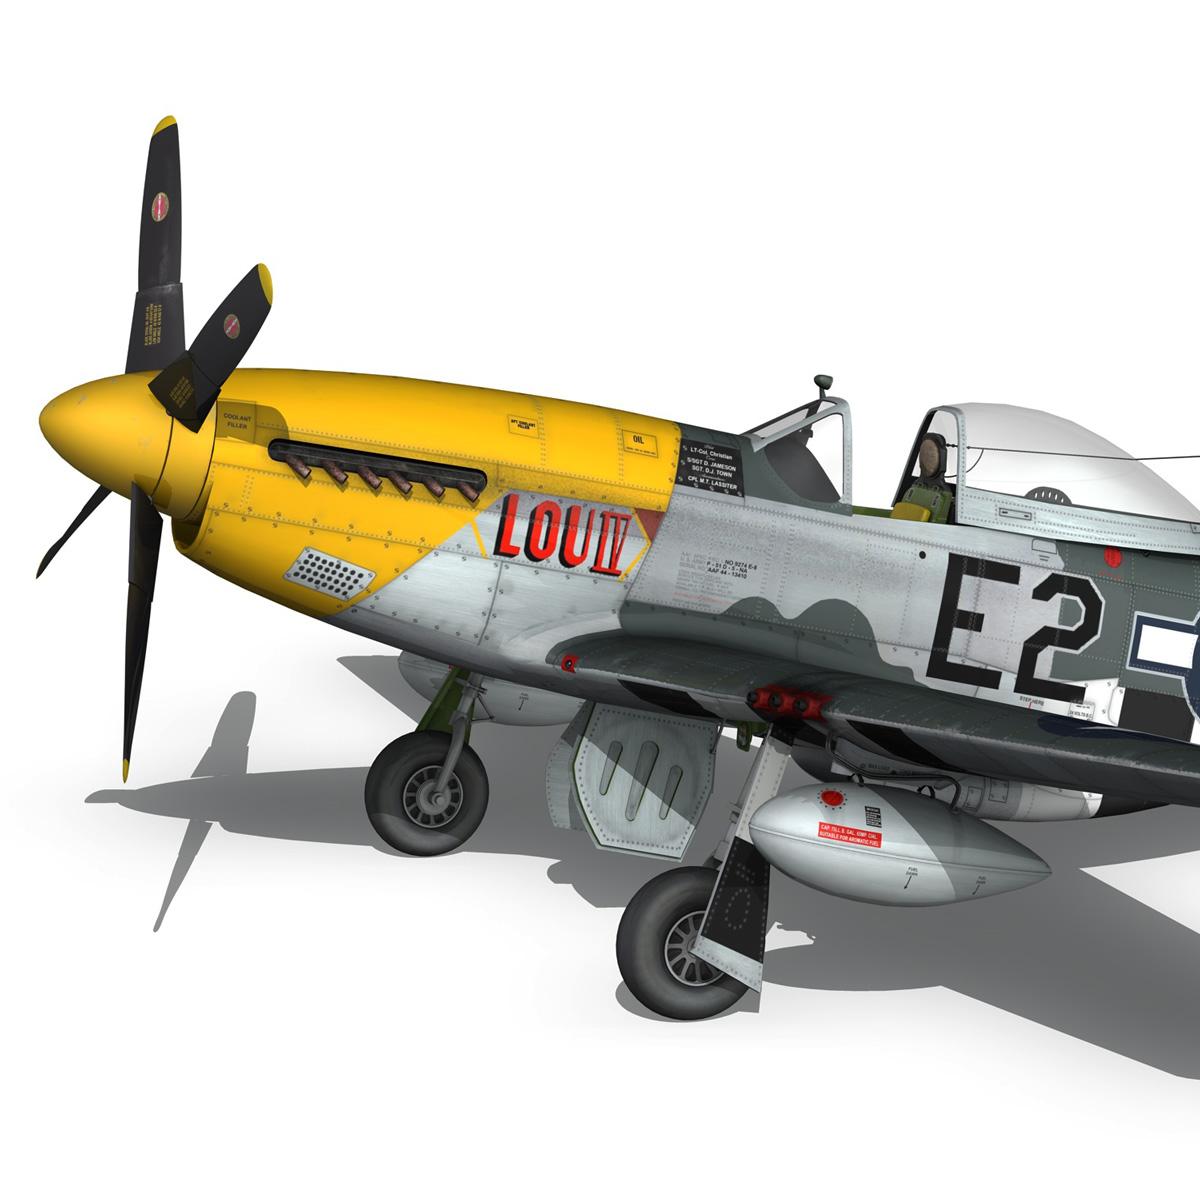 north american p-51d mustang – lou iv 3d model fbx c4d lwo obj 272607